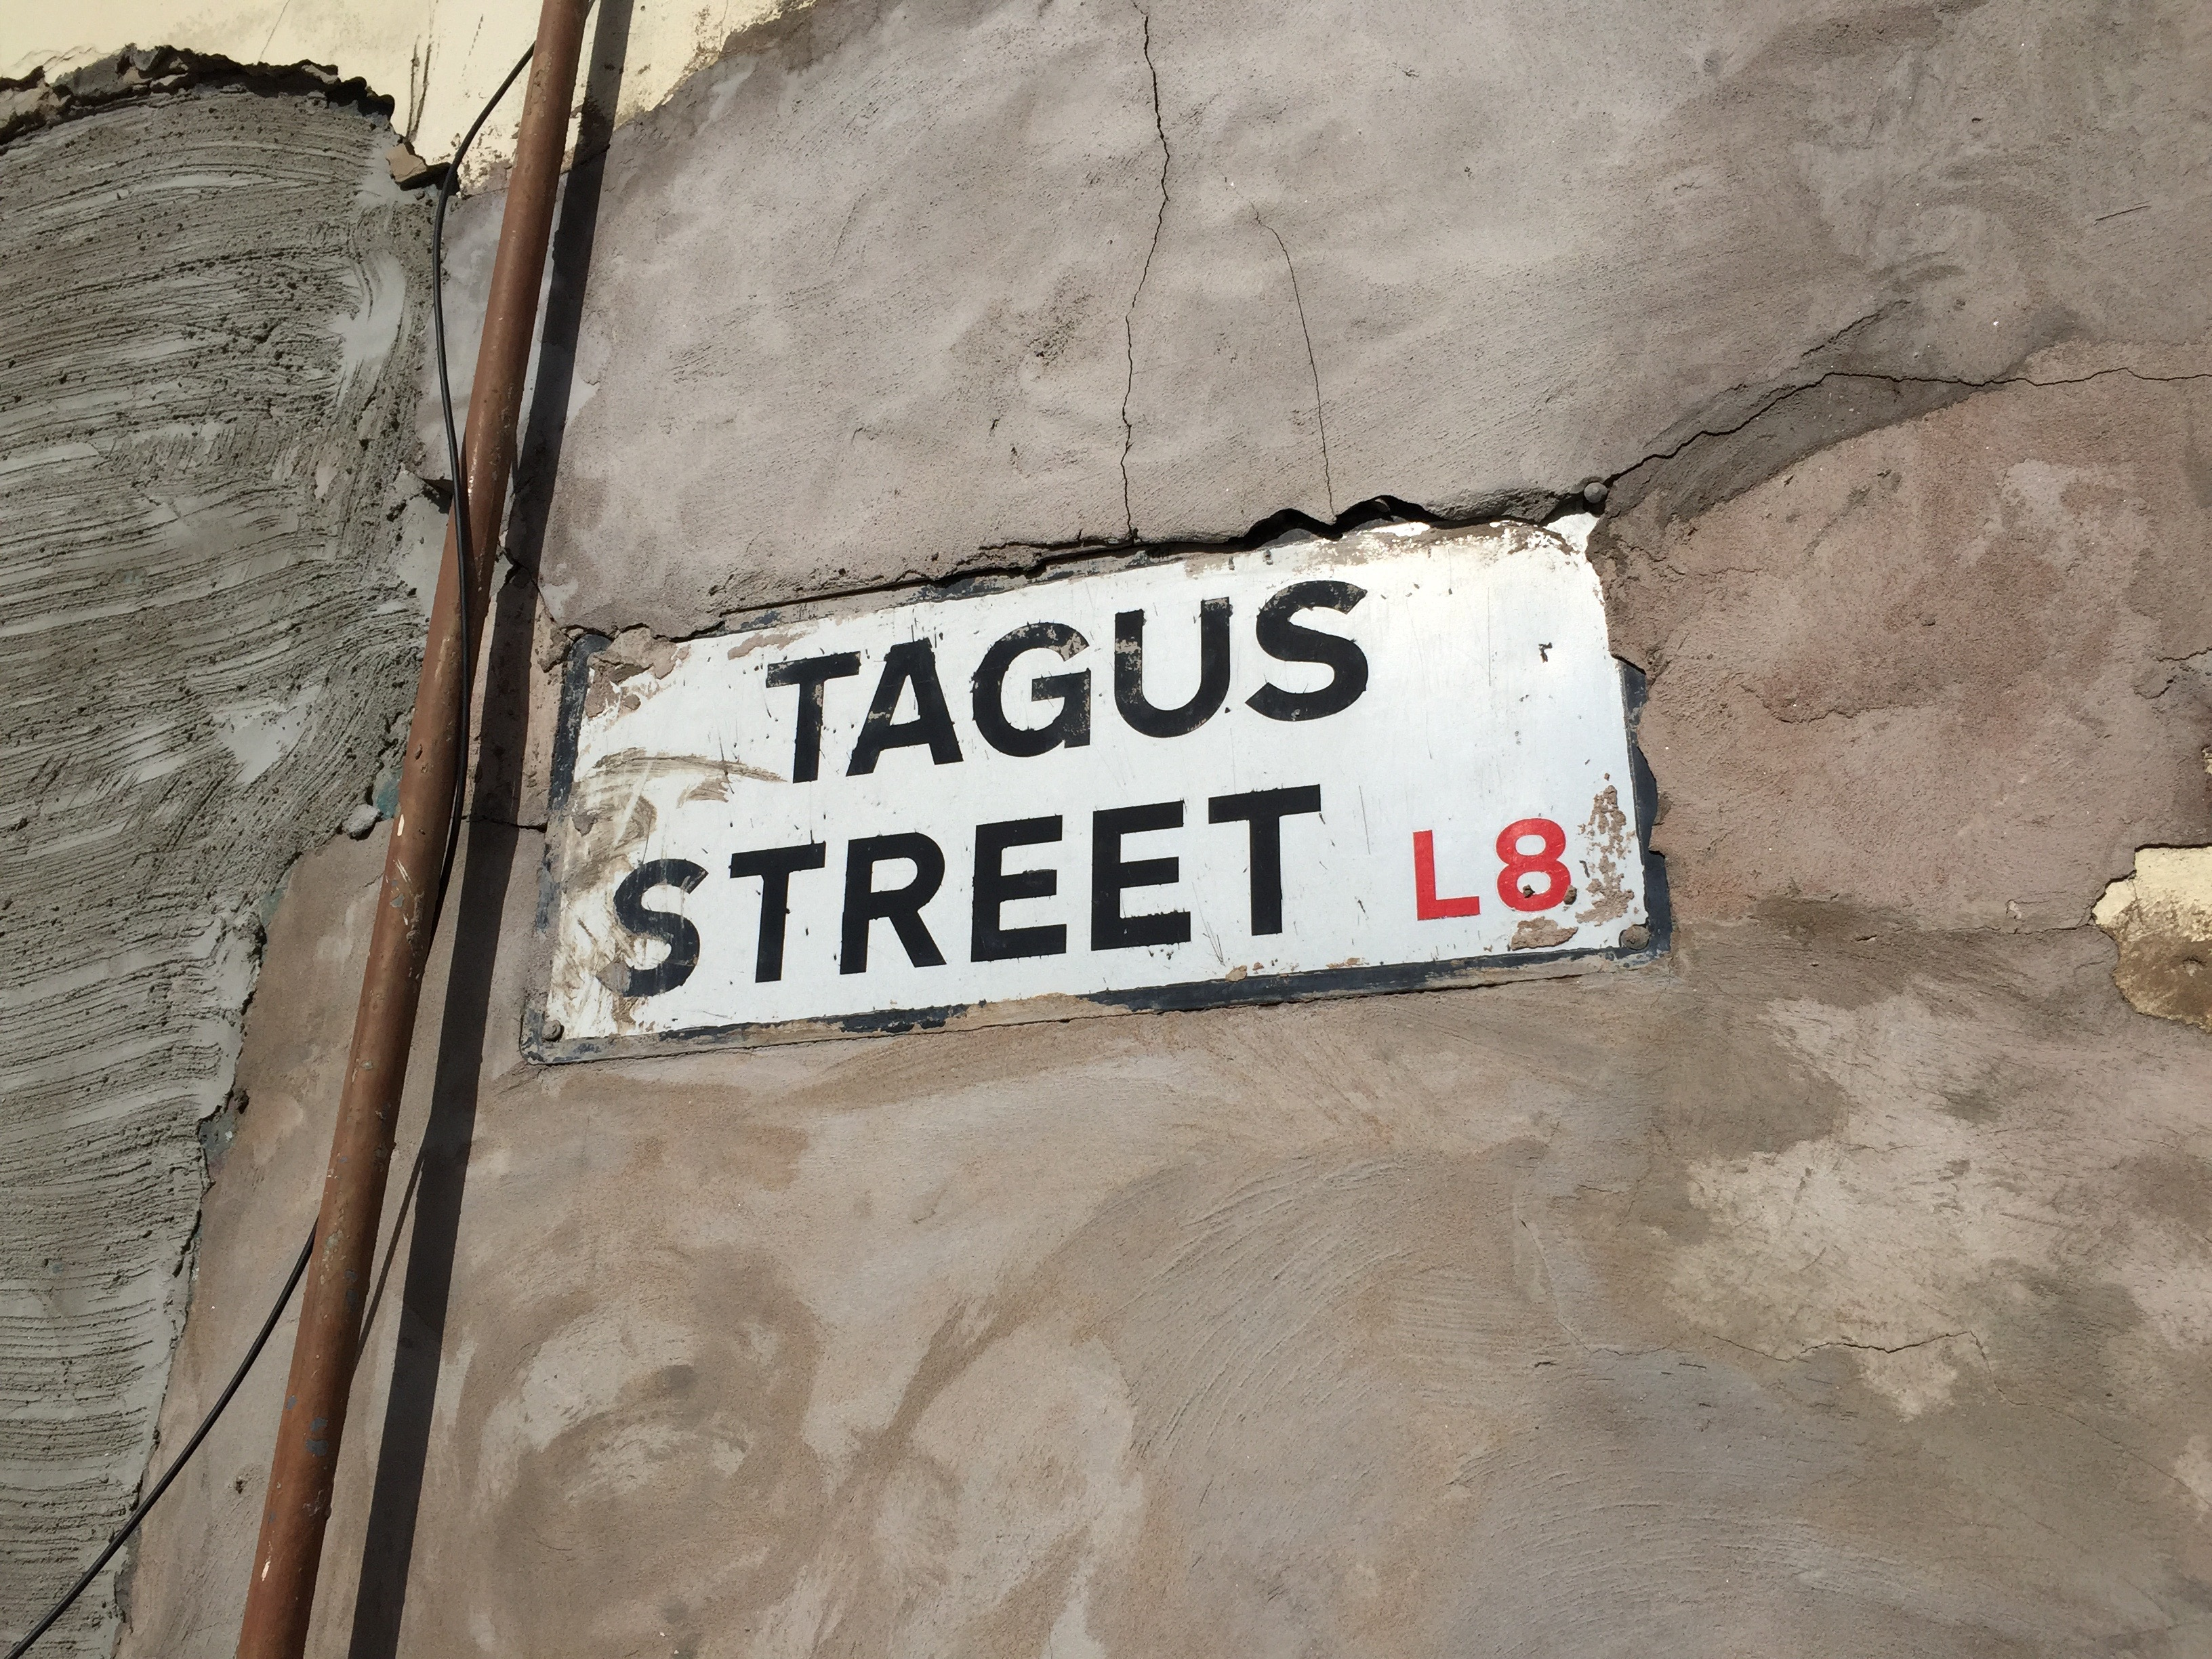 LSKC Tagus Street L 8